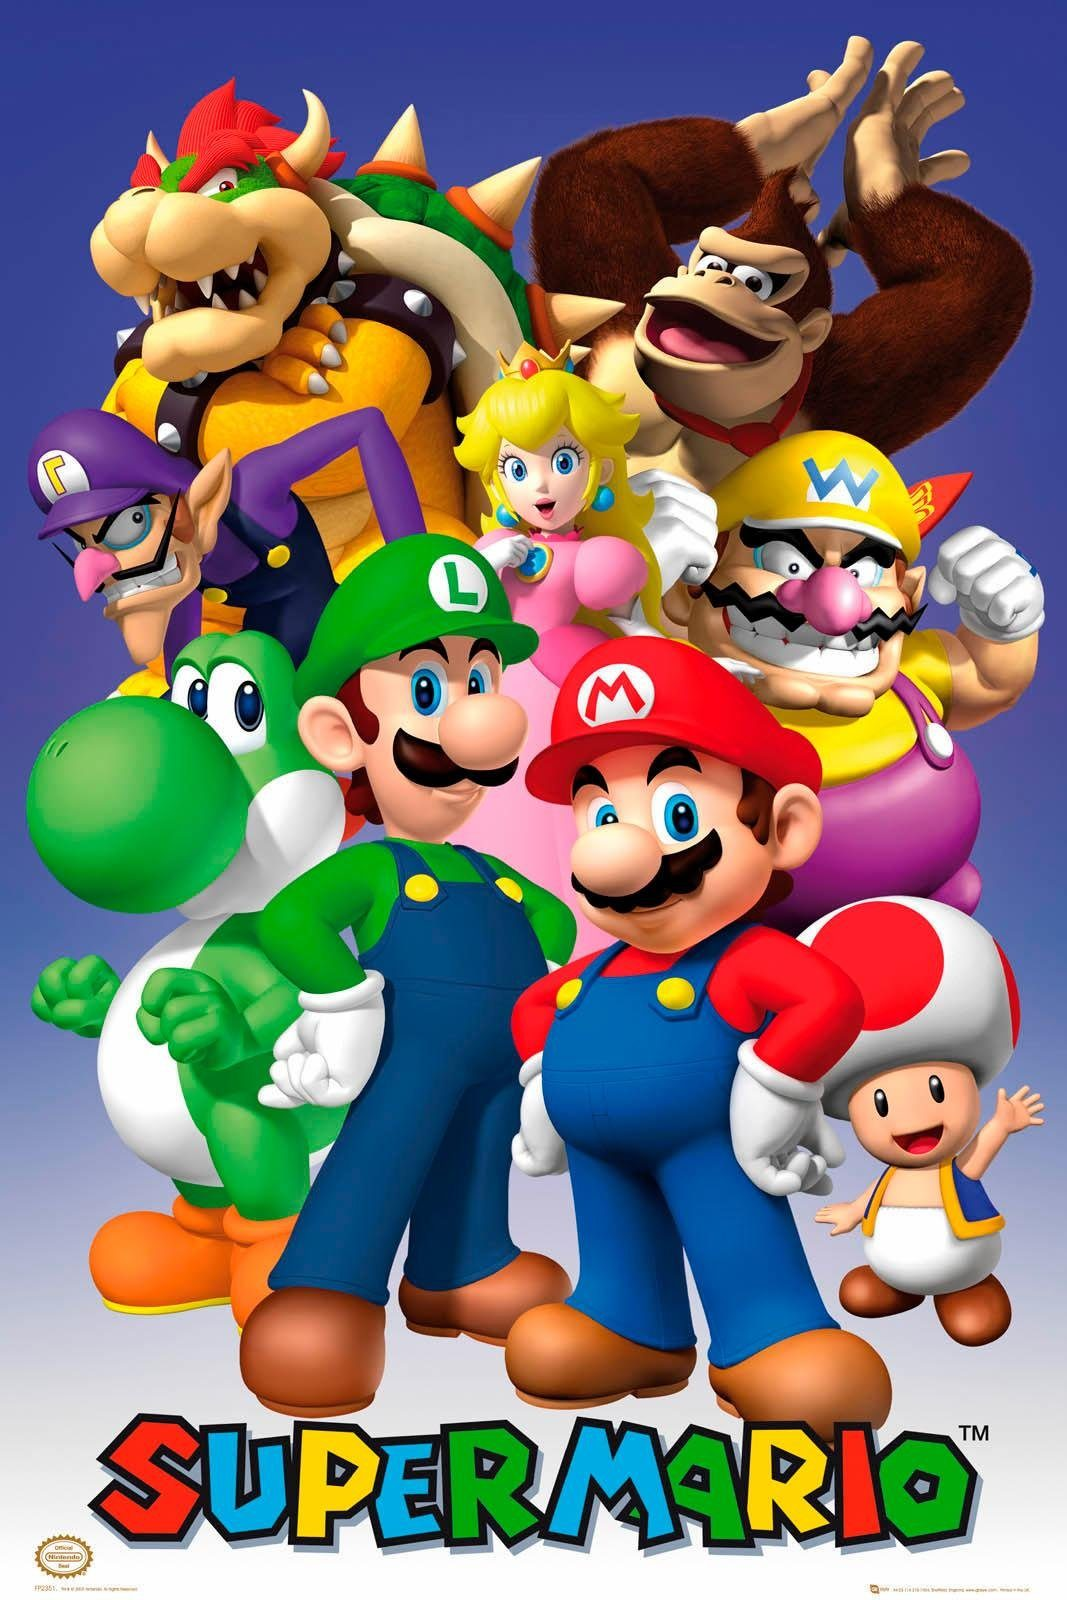 Deco-Panel »Nintendo«, Game-Plakat, 60/90 cm